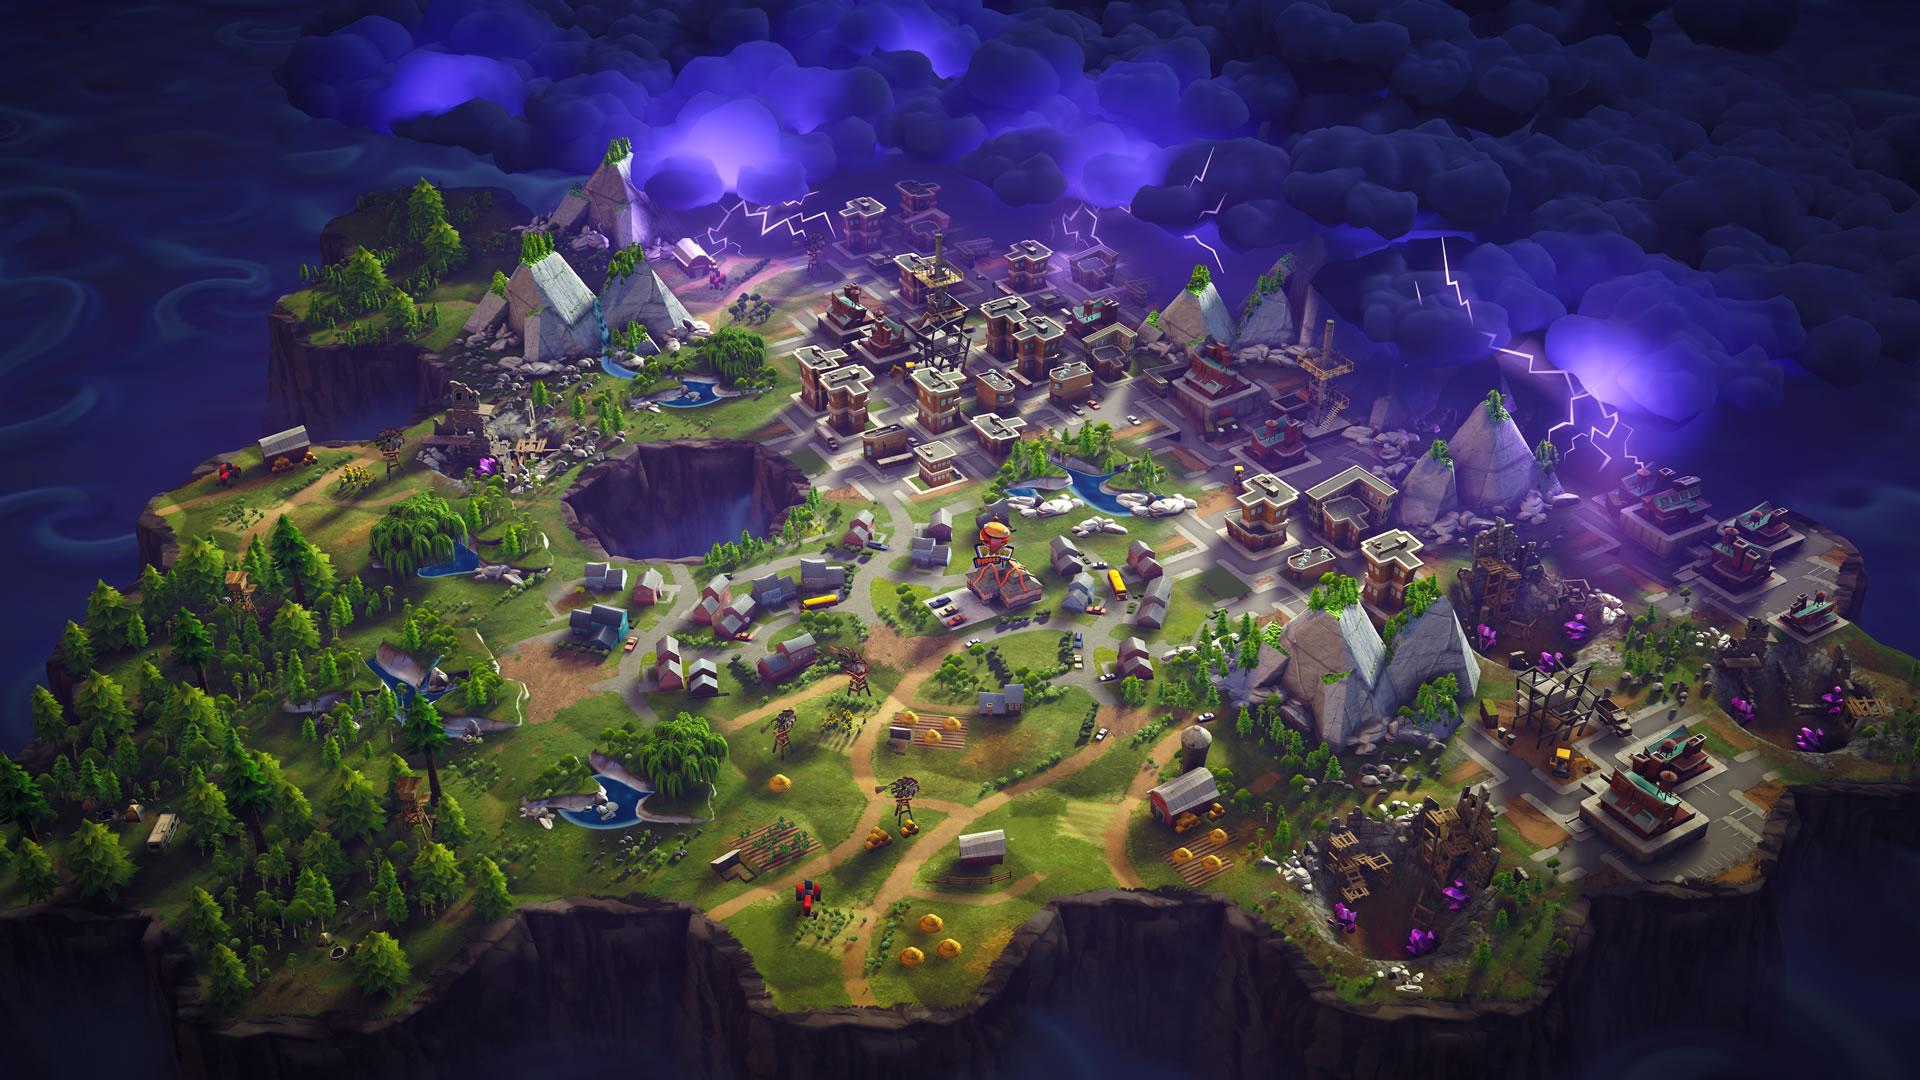 download wallpaper: Fortnite Battle Royale kaart wallpaper